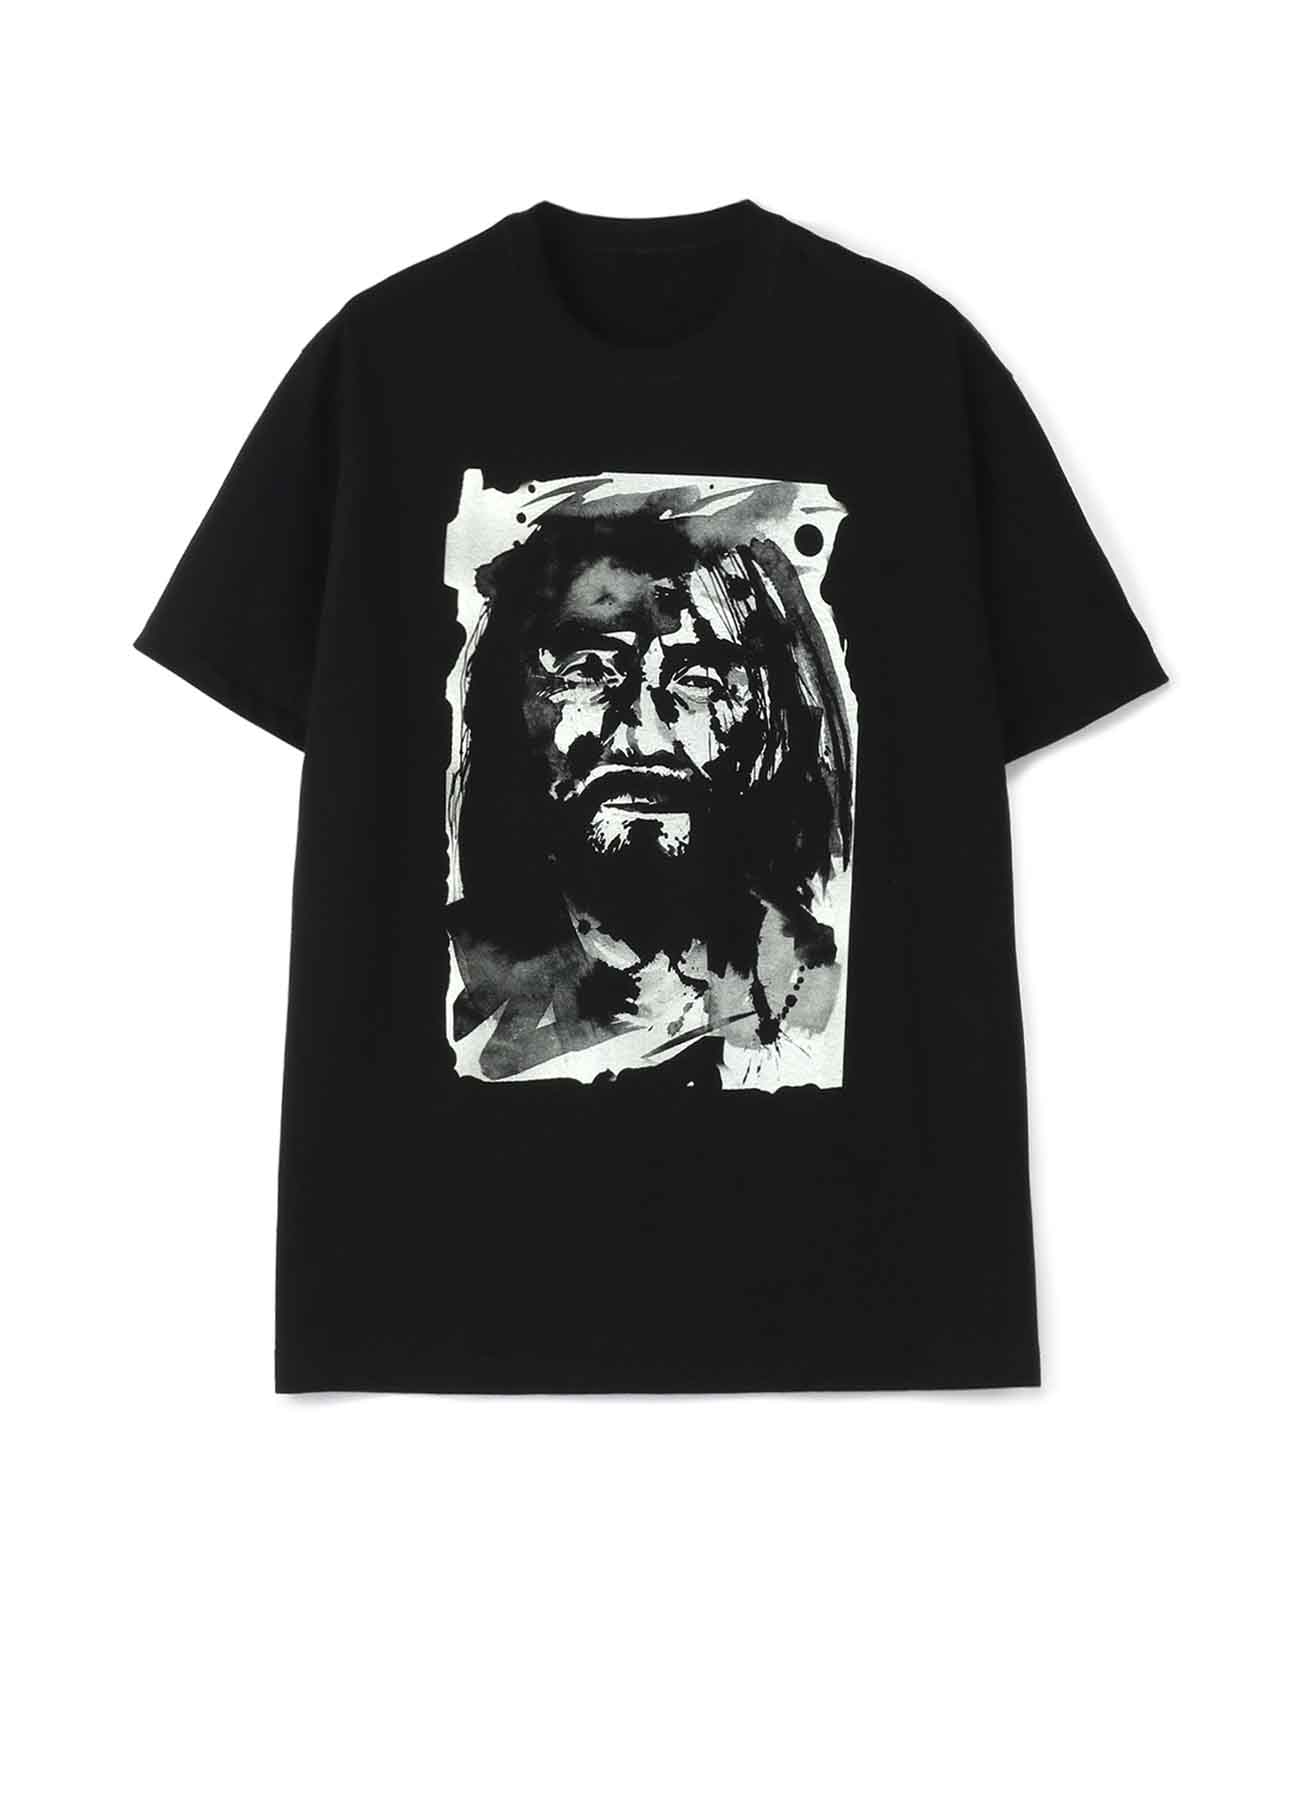 20/CottonJersey Yohji Portrait by Yasuto Sasada T-Shirt